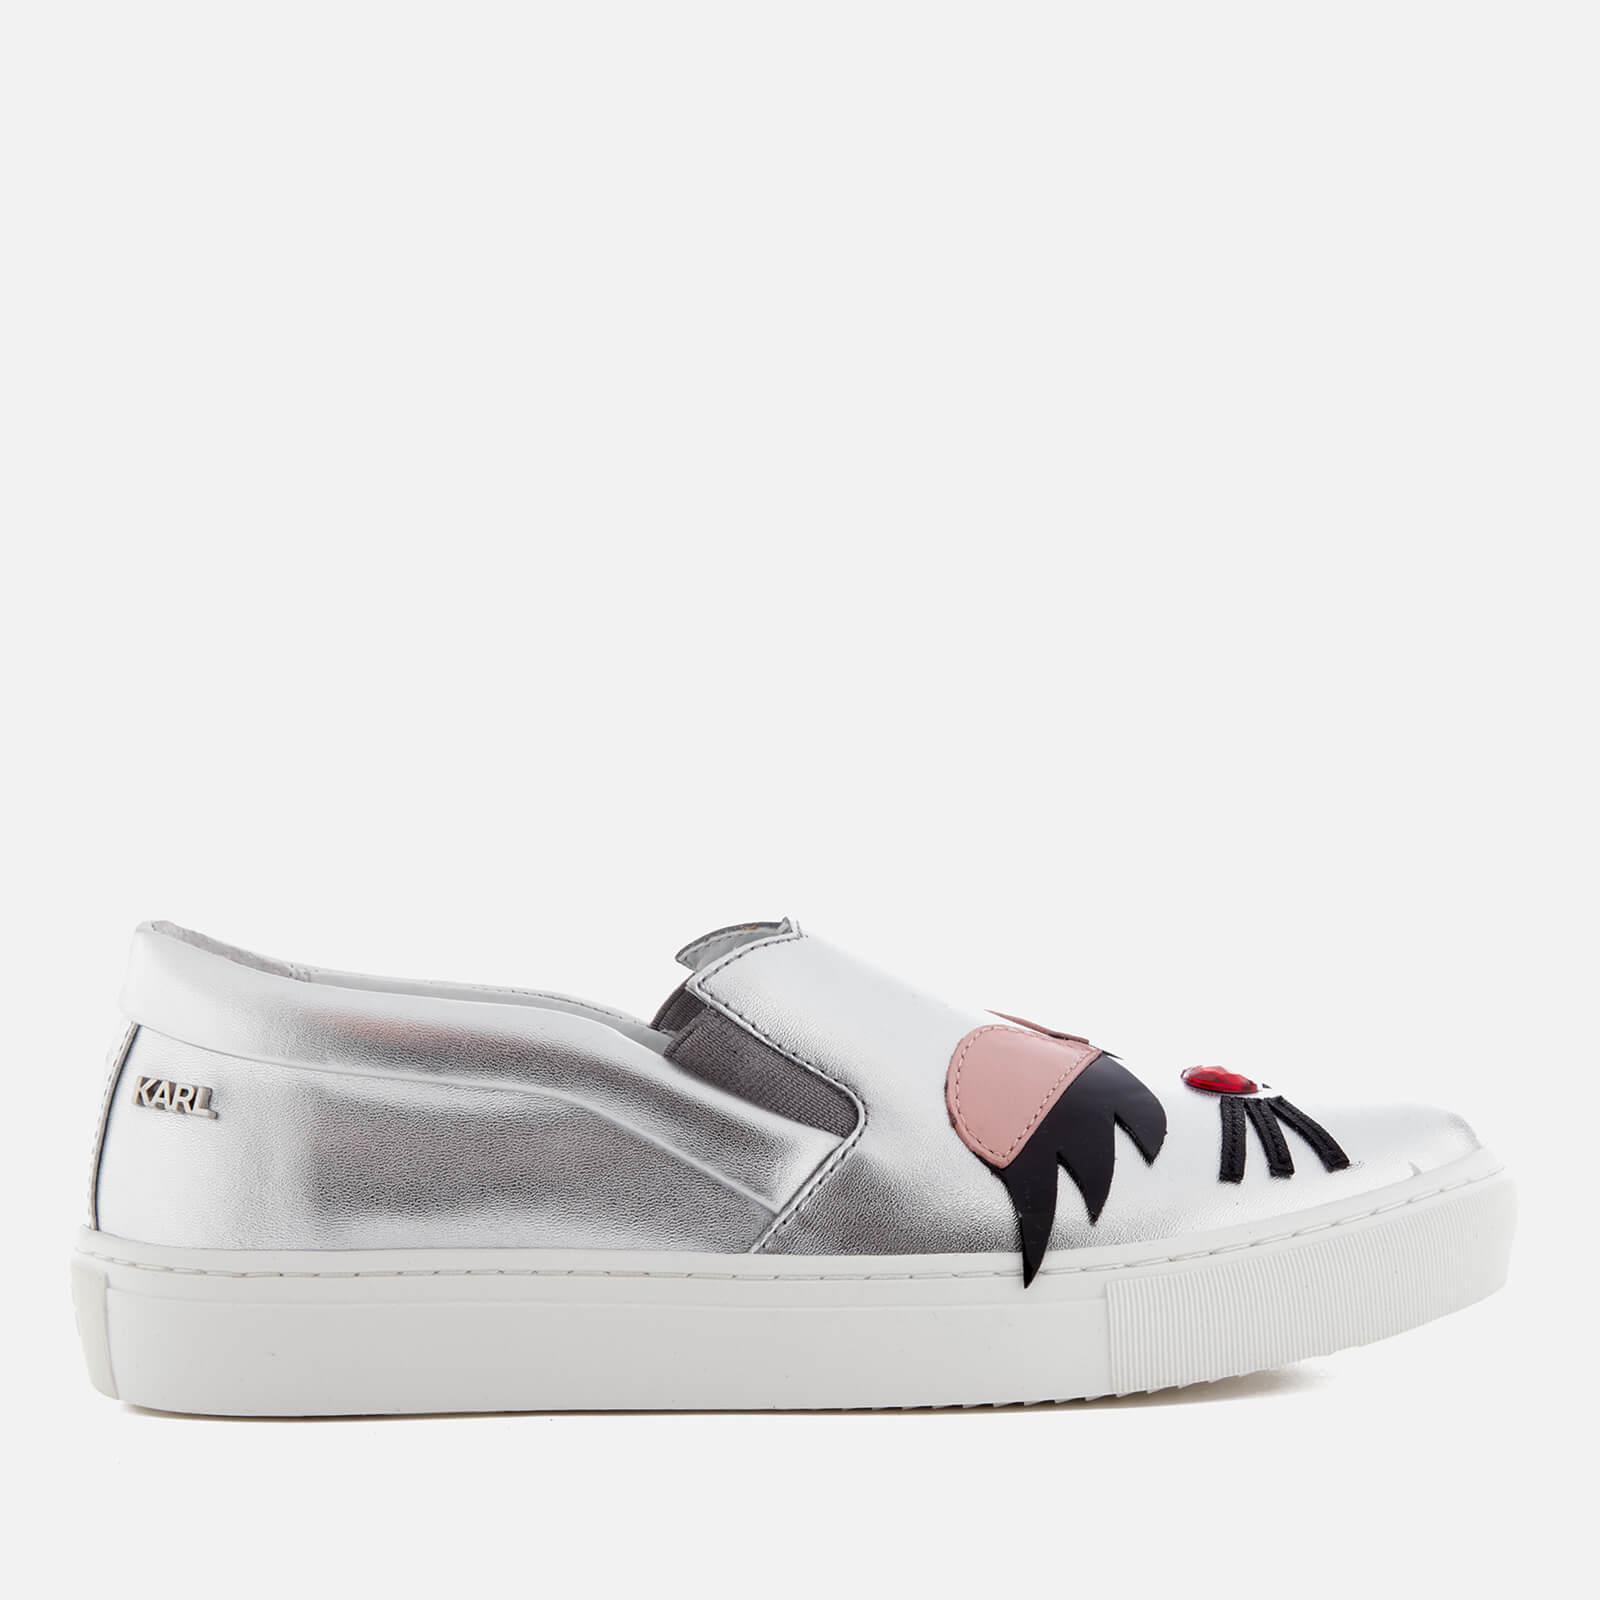 Kupsole Choupette Lash slip on sneakers - Metallic Karl Lagerfeld jJoTj4v